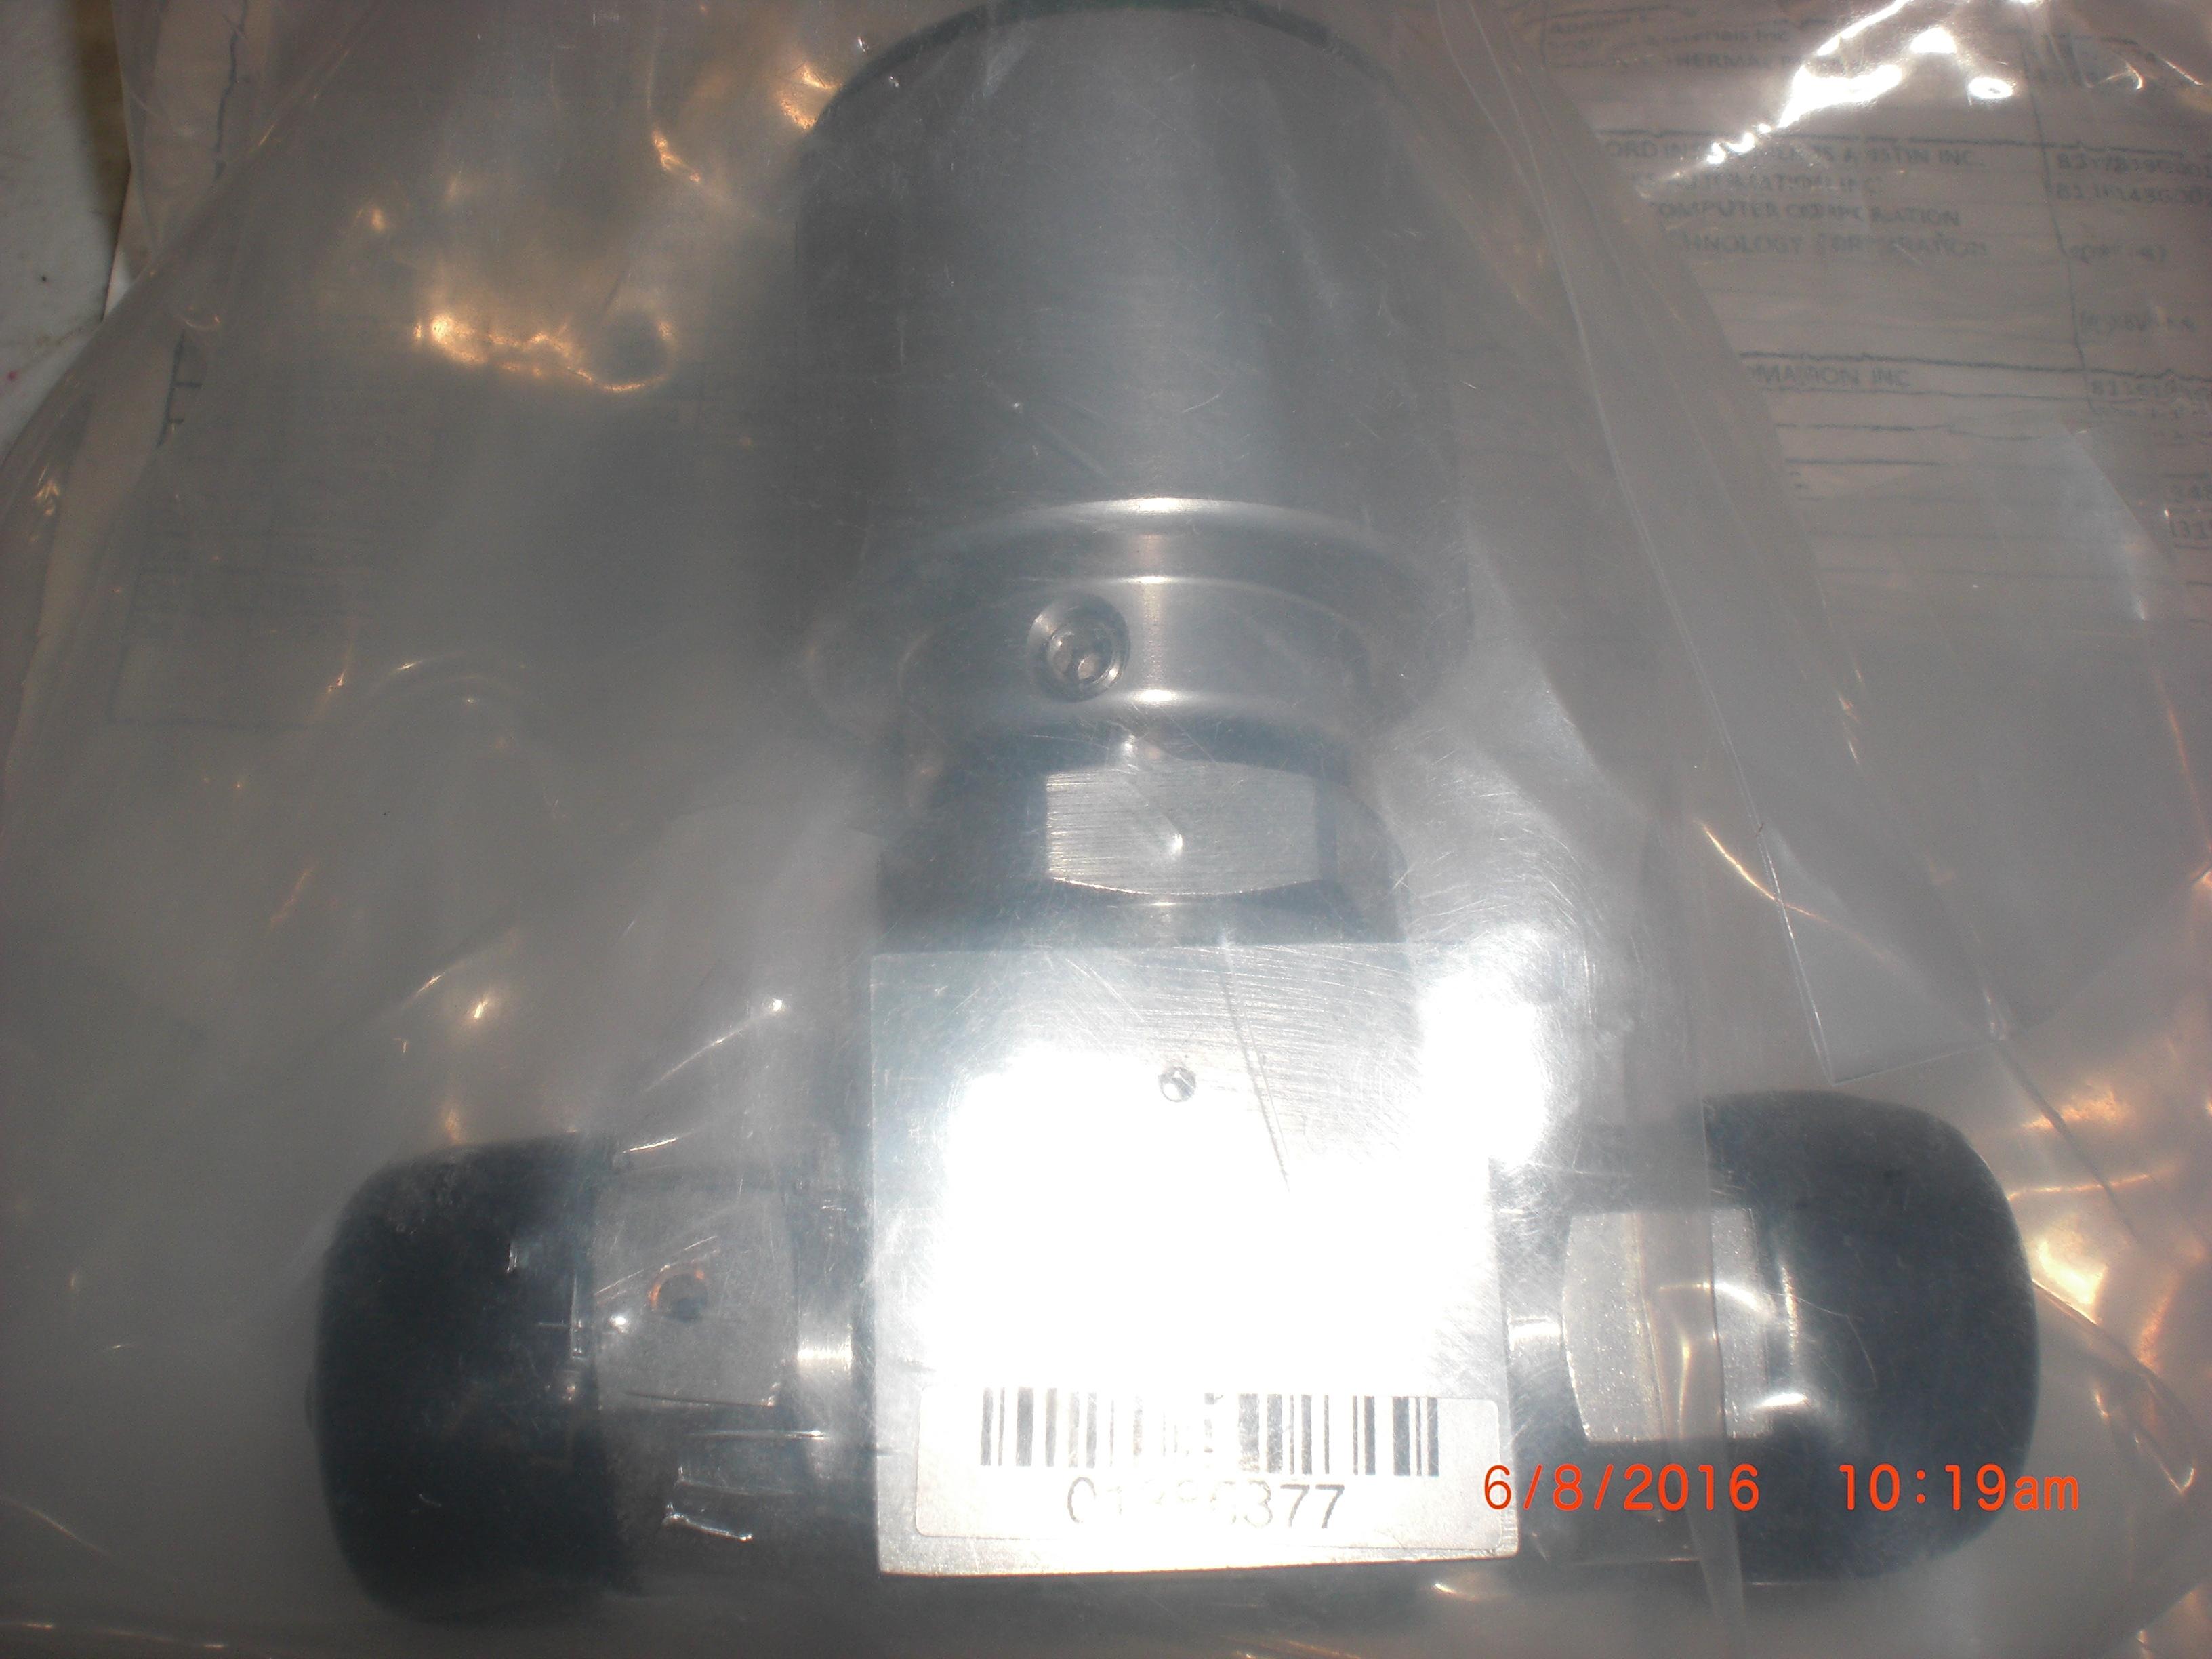 Valve APTECH... AP3580S 2PW FV4 FV4 pneumatic Diaphragm Valve NO